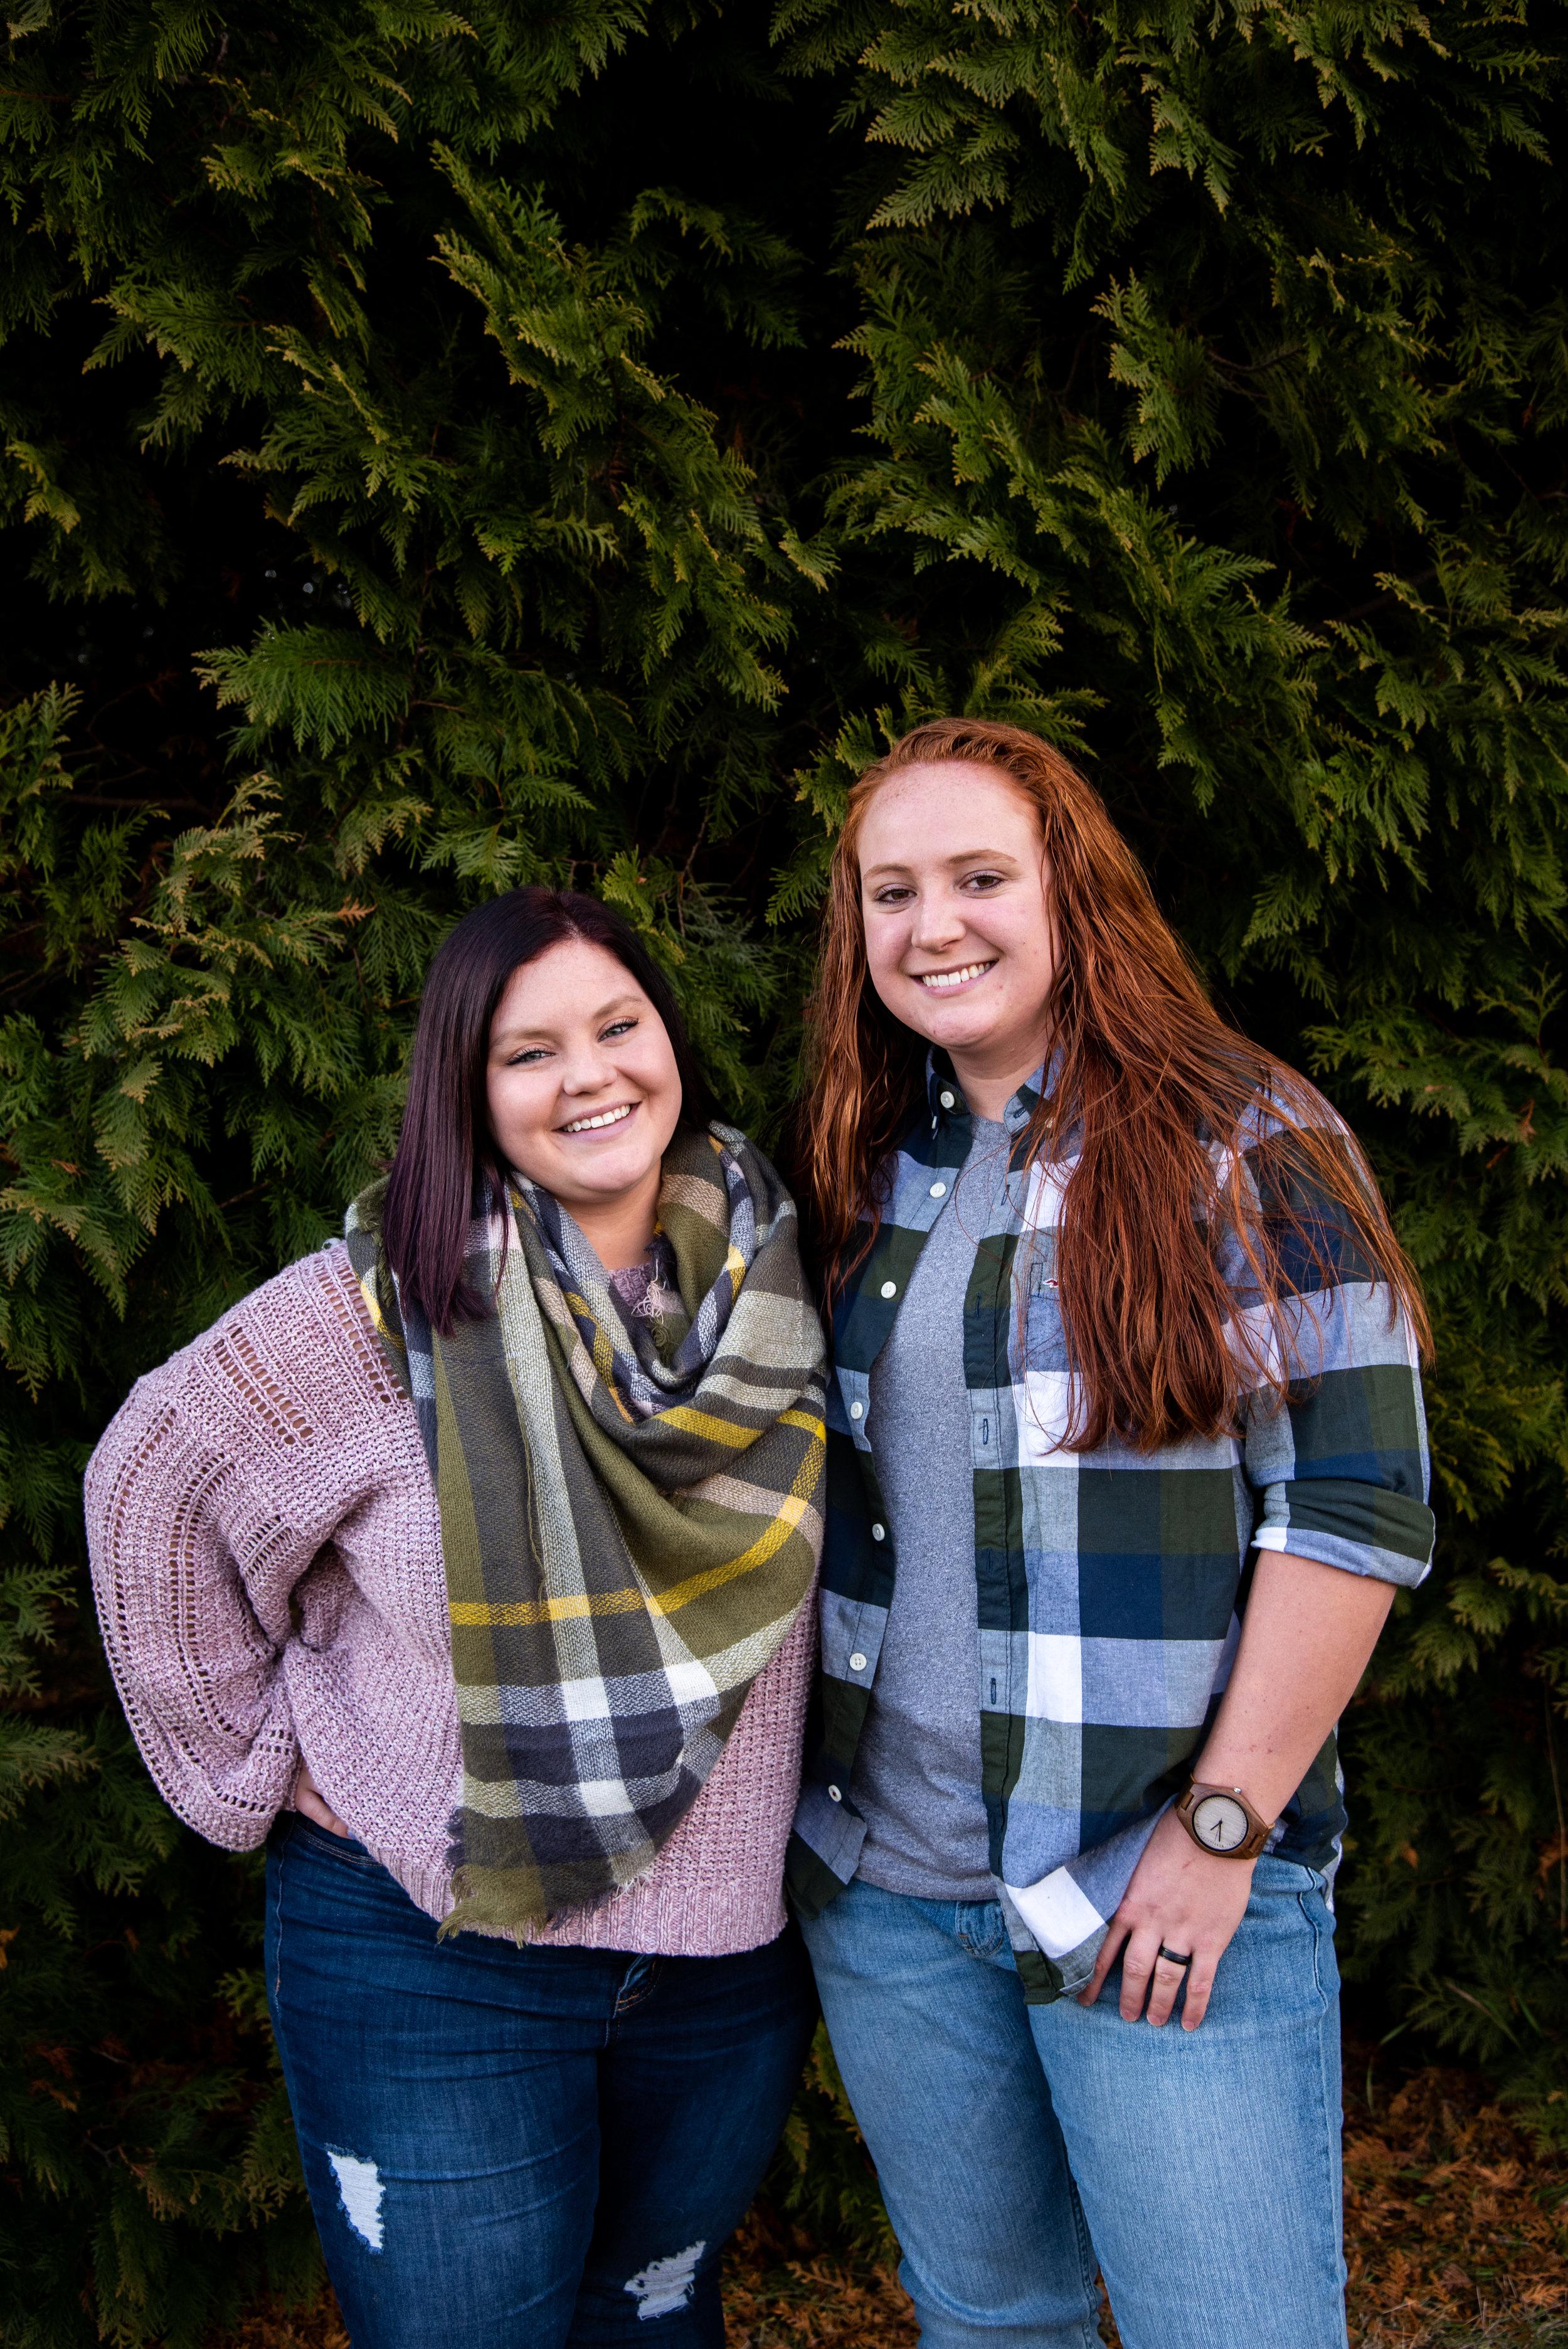 Kyla Jo Photography // Muncie Indiana Photographer // Family Photos // Whitetail Tree Farm // Wife and Wife // Winter Photo Shoot // Christmas Tree Farm Photo Session // Couples Goals